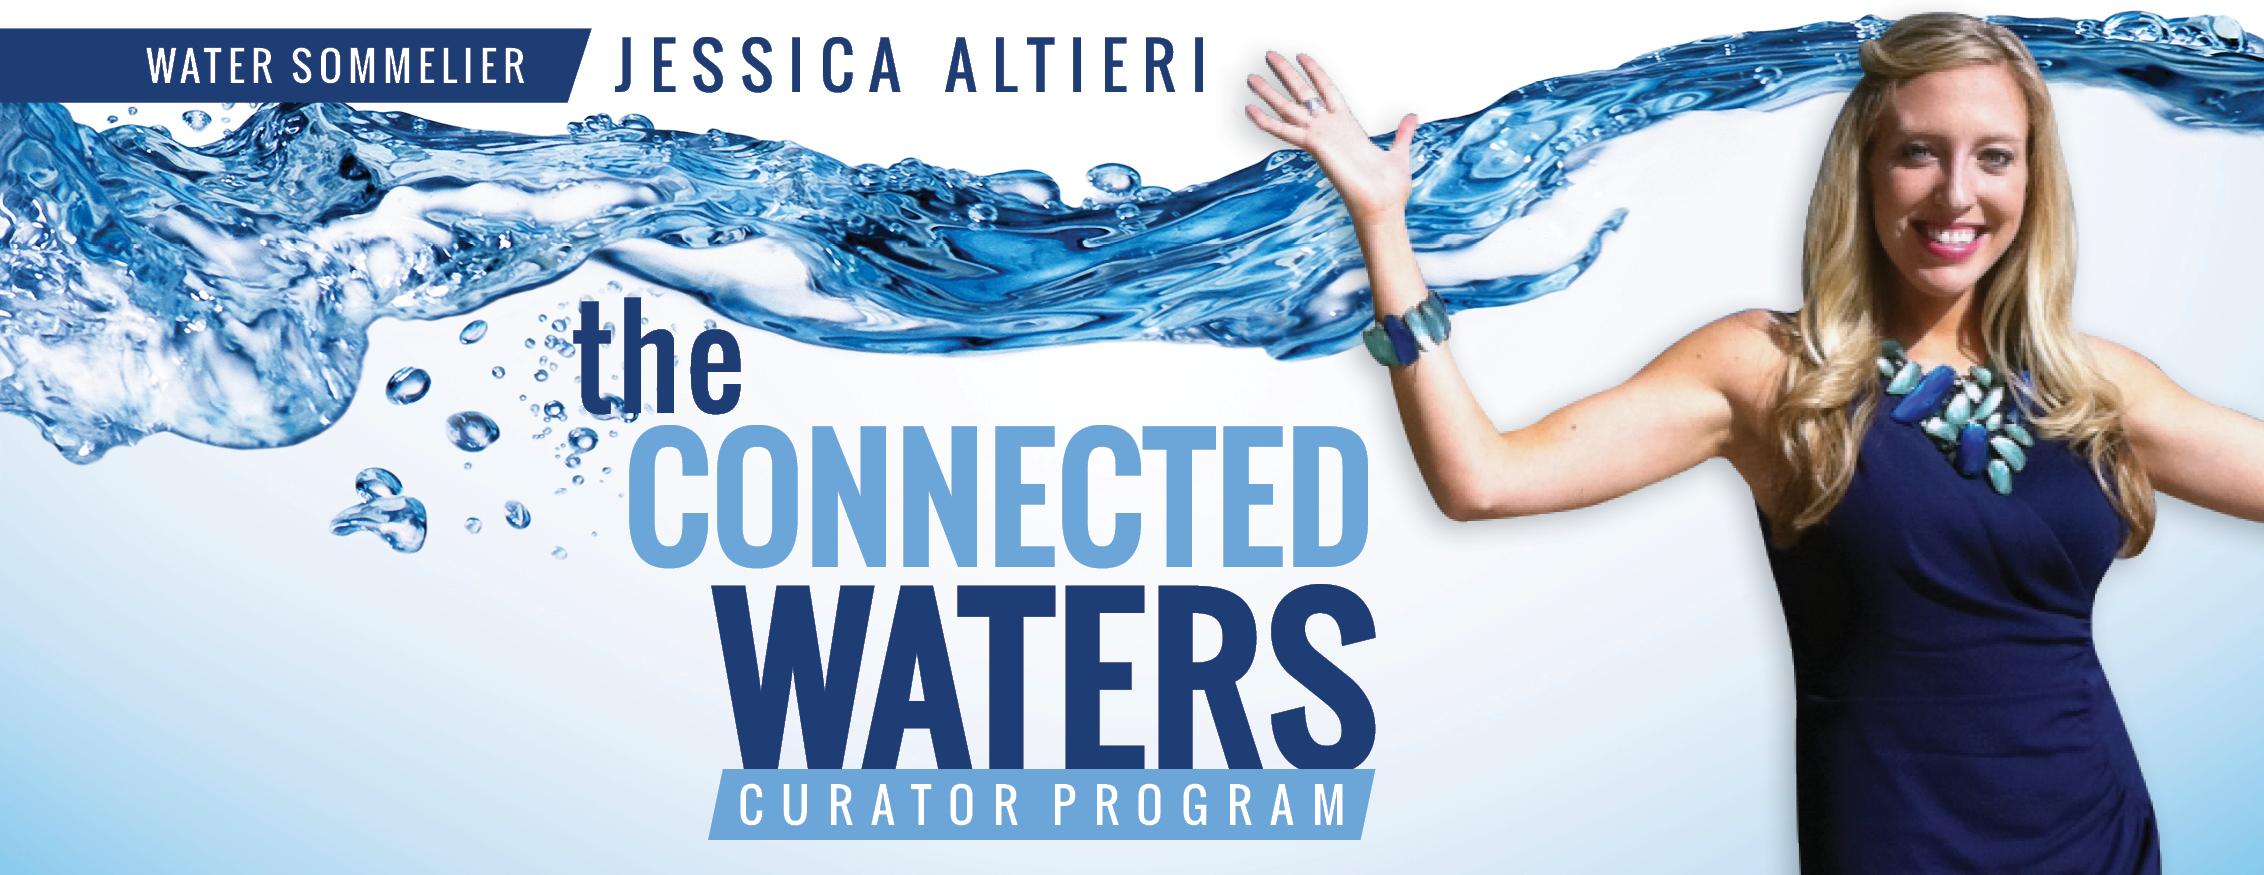 Water_Sommelier_Jessica_Altieri.jpg